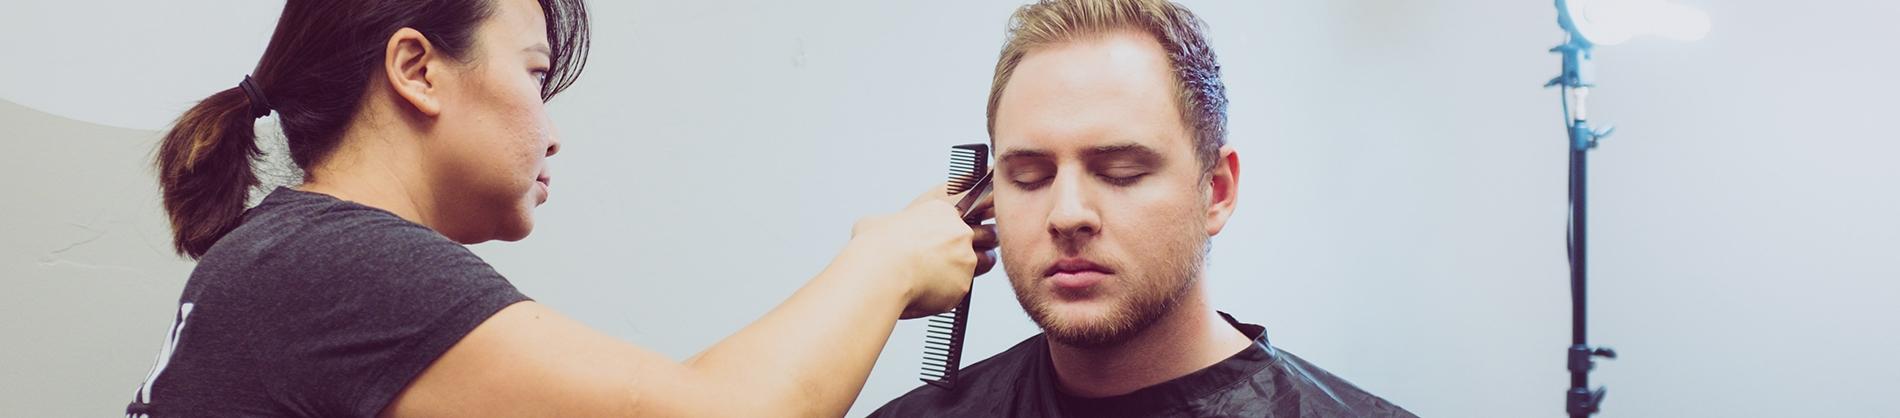 A women cutting a man's hair in a barbers shop